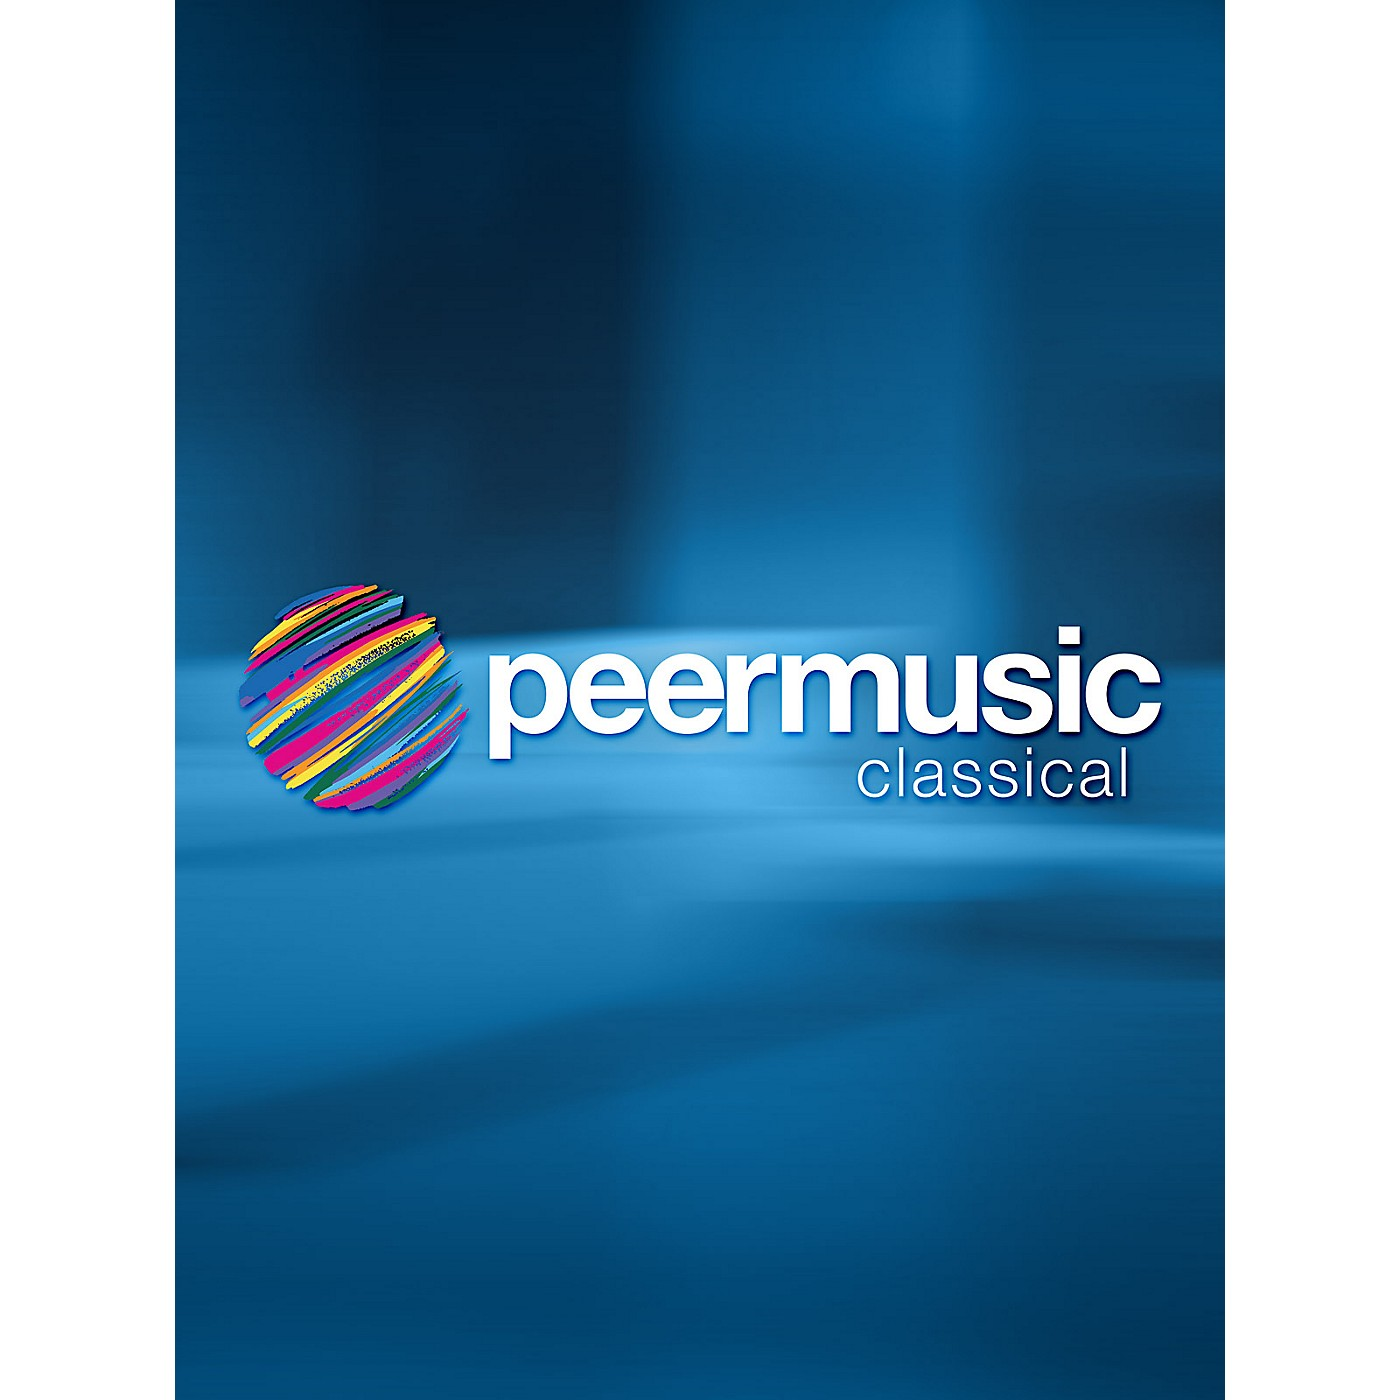 Peer Music A Brass Serenade (Brass Quintet) Peermusic Classical Series Book  by Charles Ives thumbnail